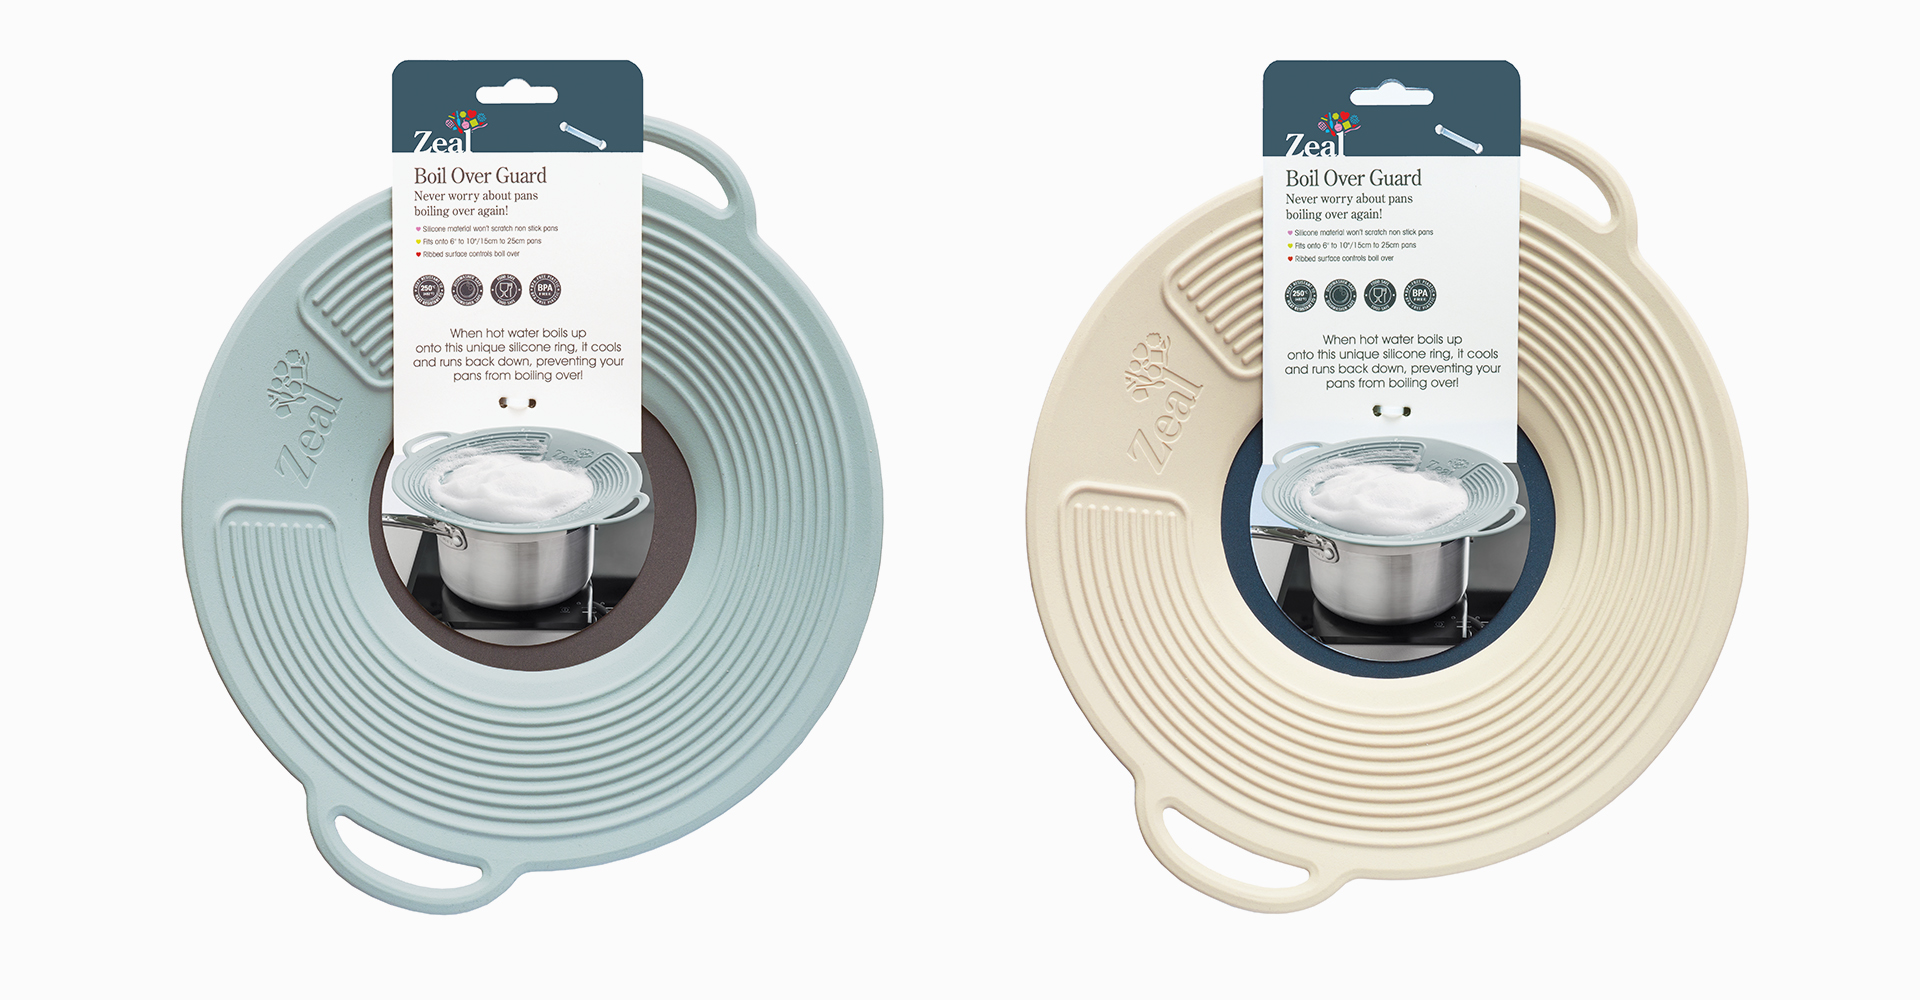 CKS Zeal 2018 range| CKS - Zeal - Boil over lid - Lid - Texture - Design - Guard - Packaging - Graphics - Graphic design - Blue - White - Handle - Functional